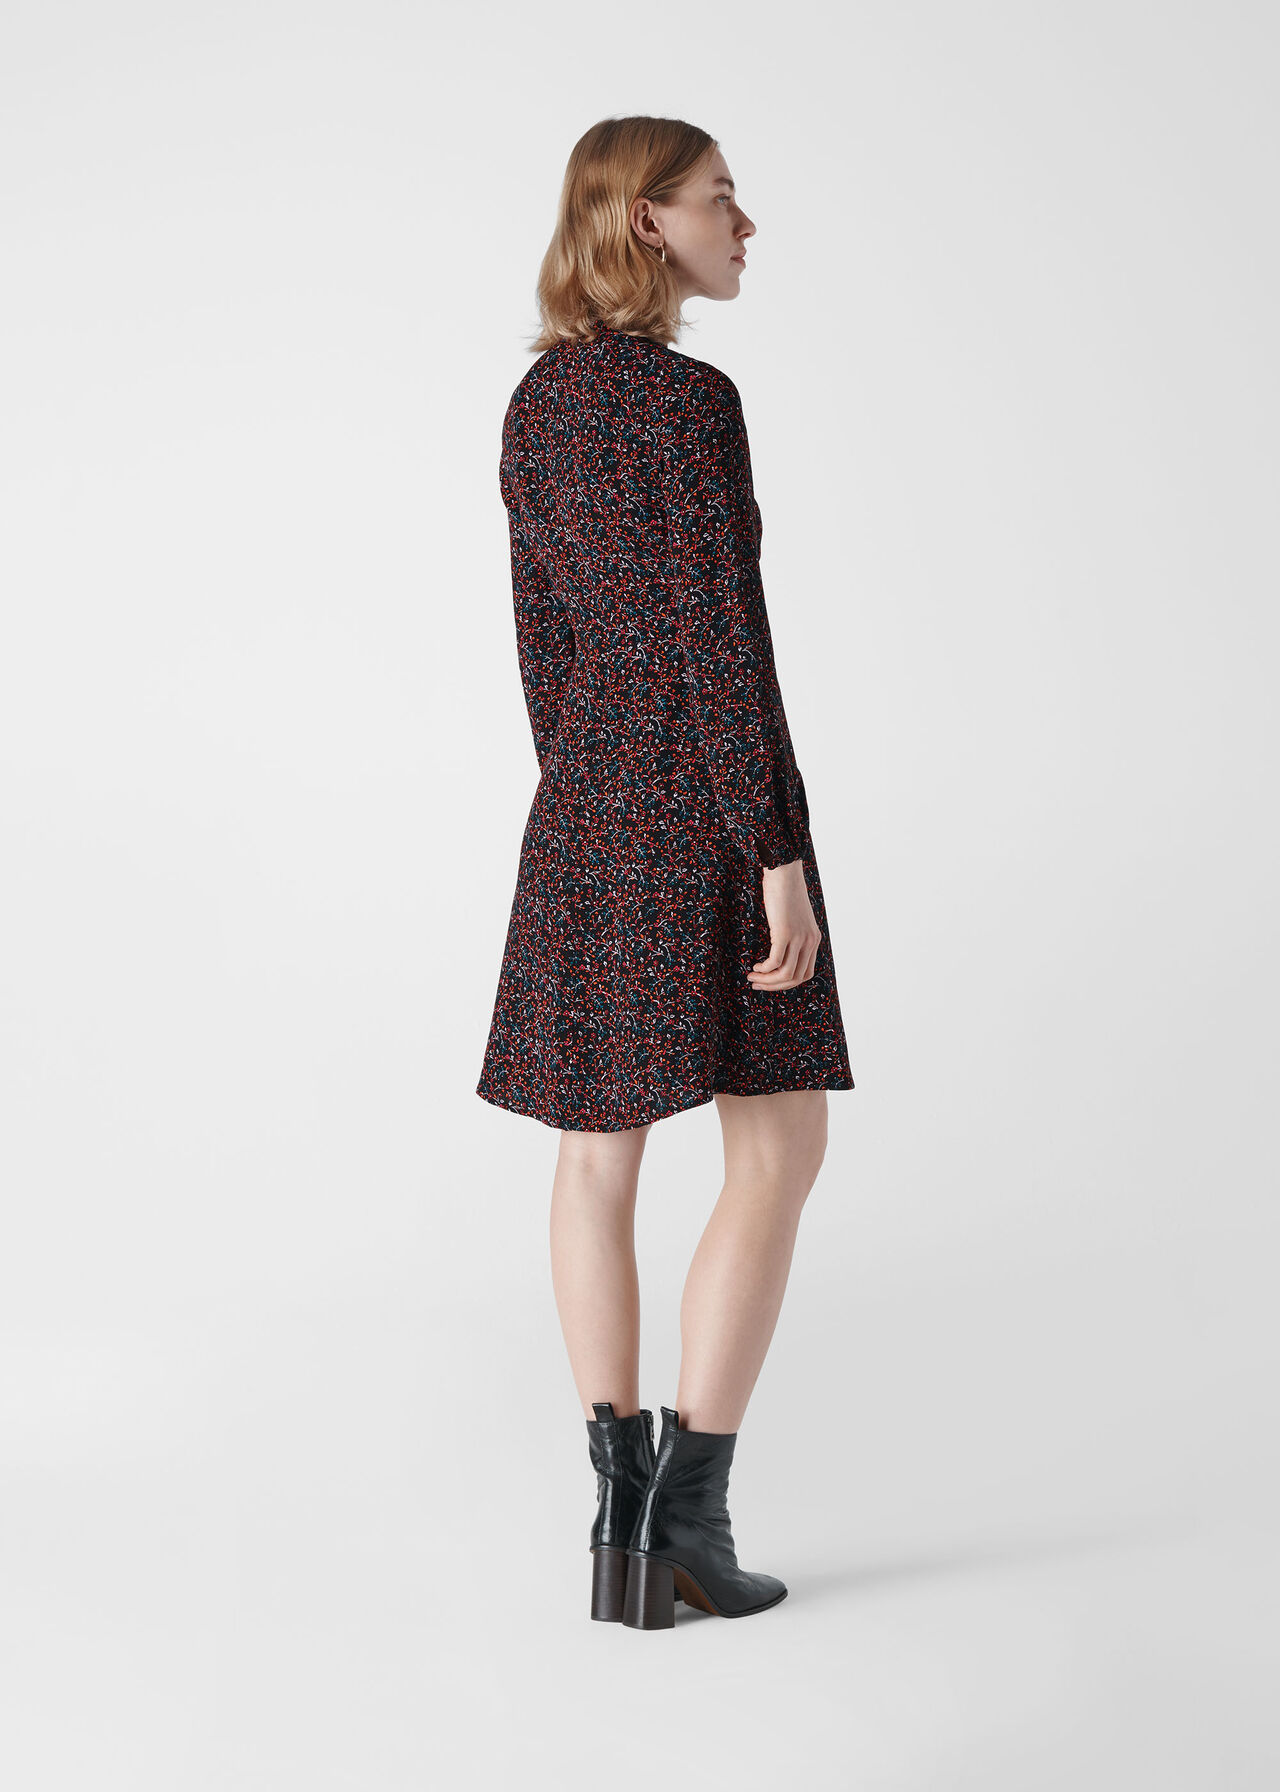 Starflower Dress Multicolour